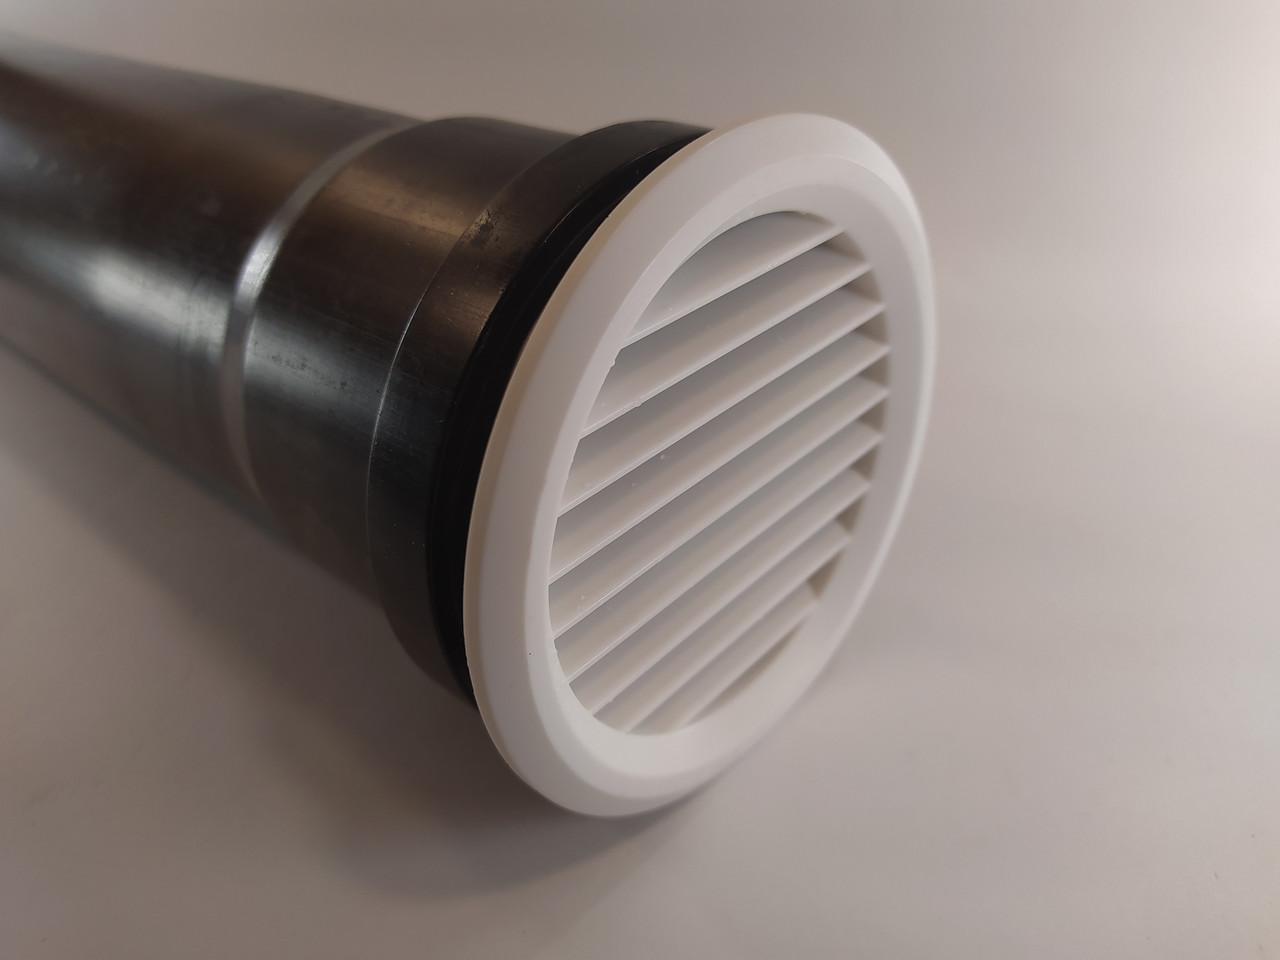 Дымоходный комплект диаметр 80мм конденсационный